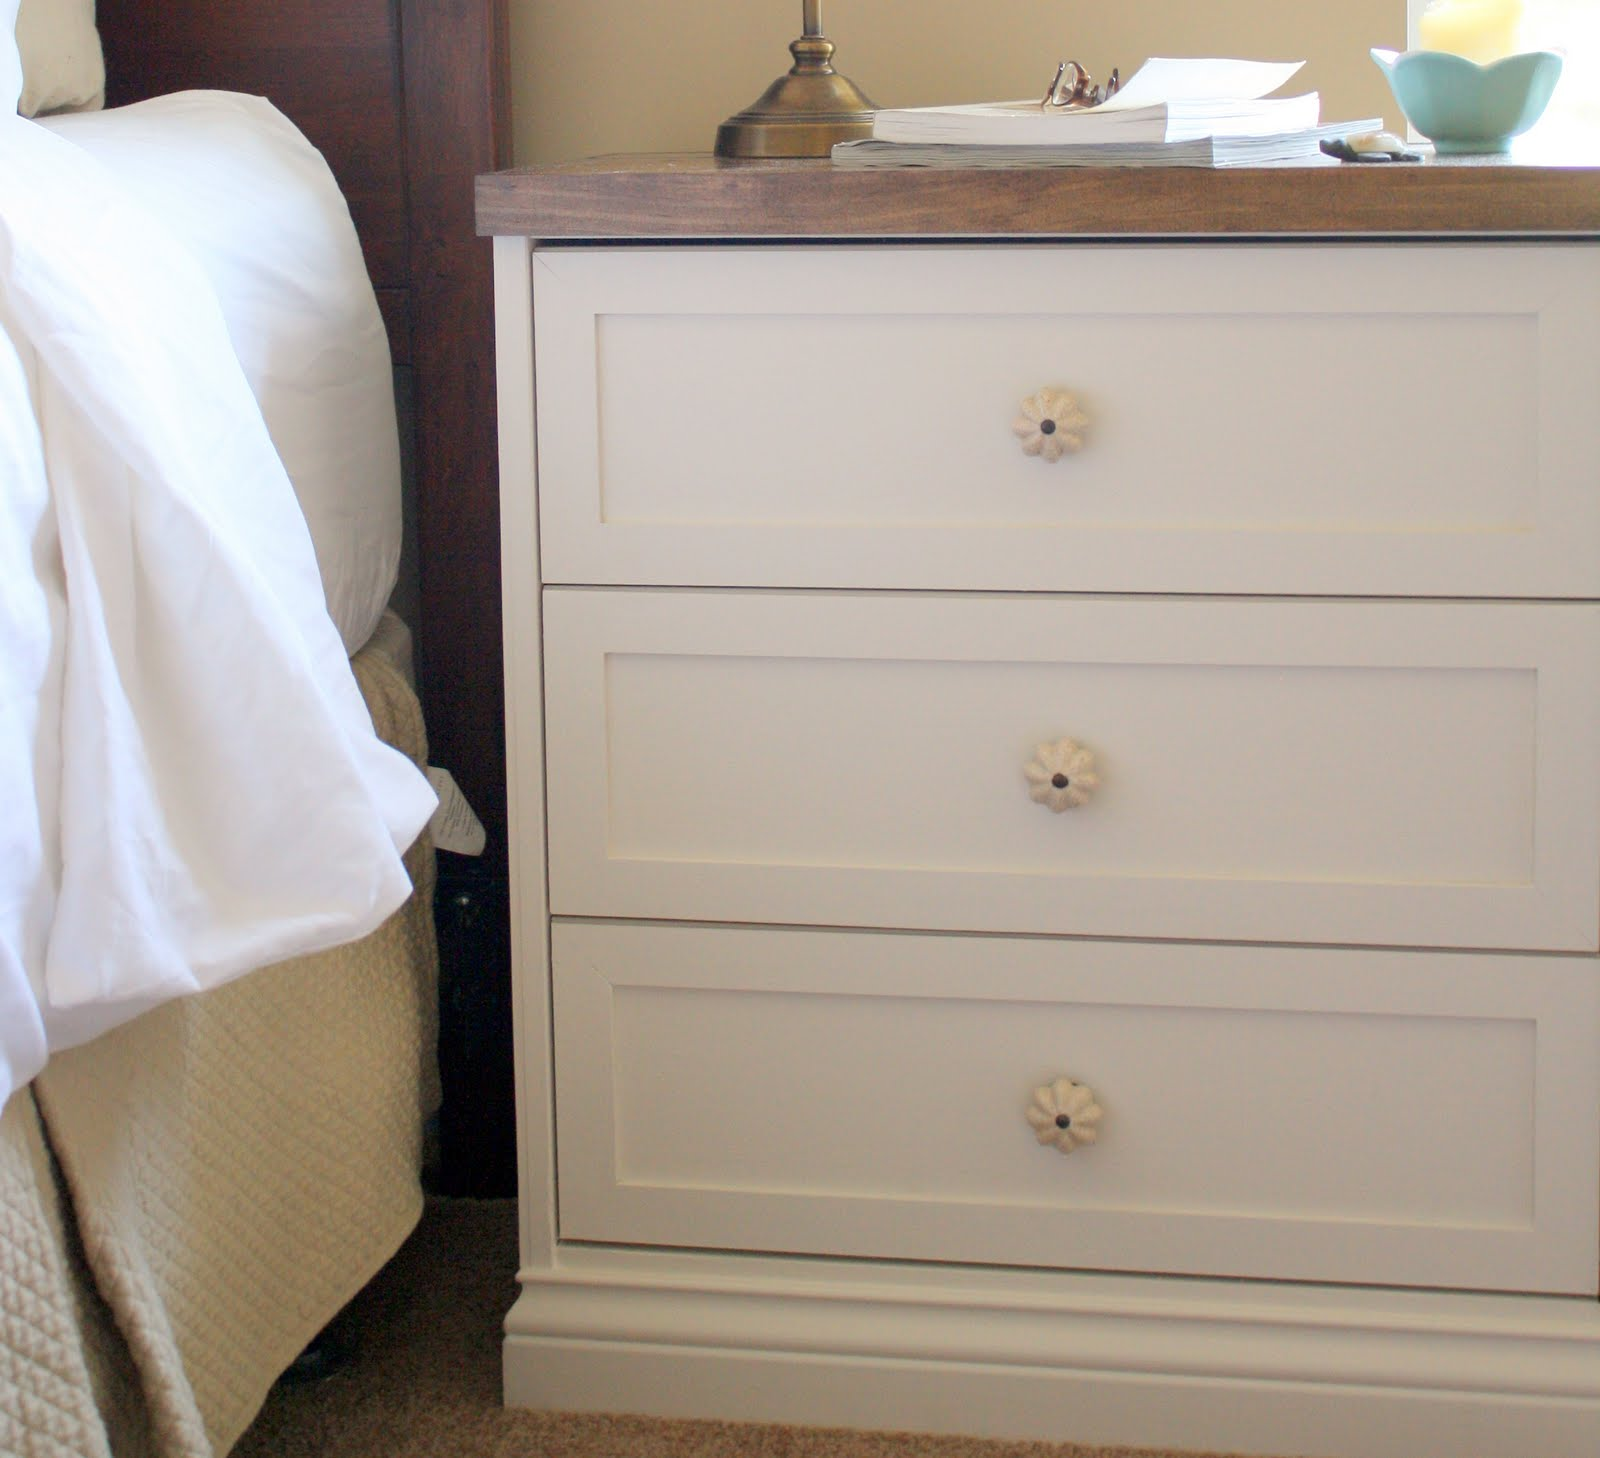 ikea closet shelving ideas - Bedside Tables a RAST hack IKEA Hackers IKEA Hackers